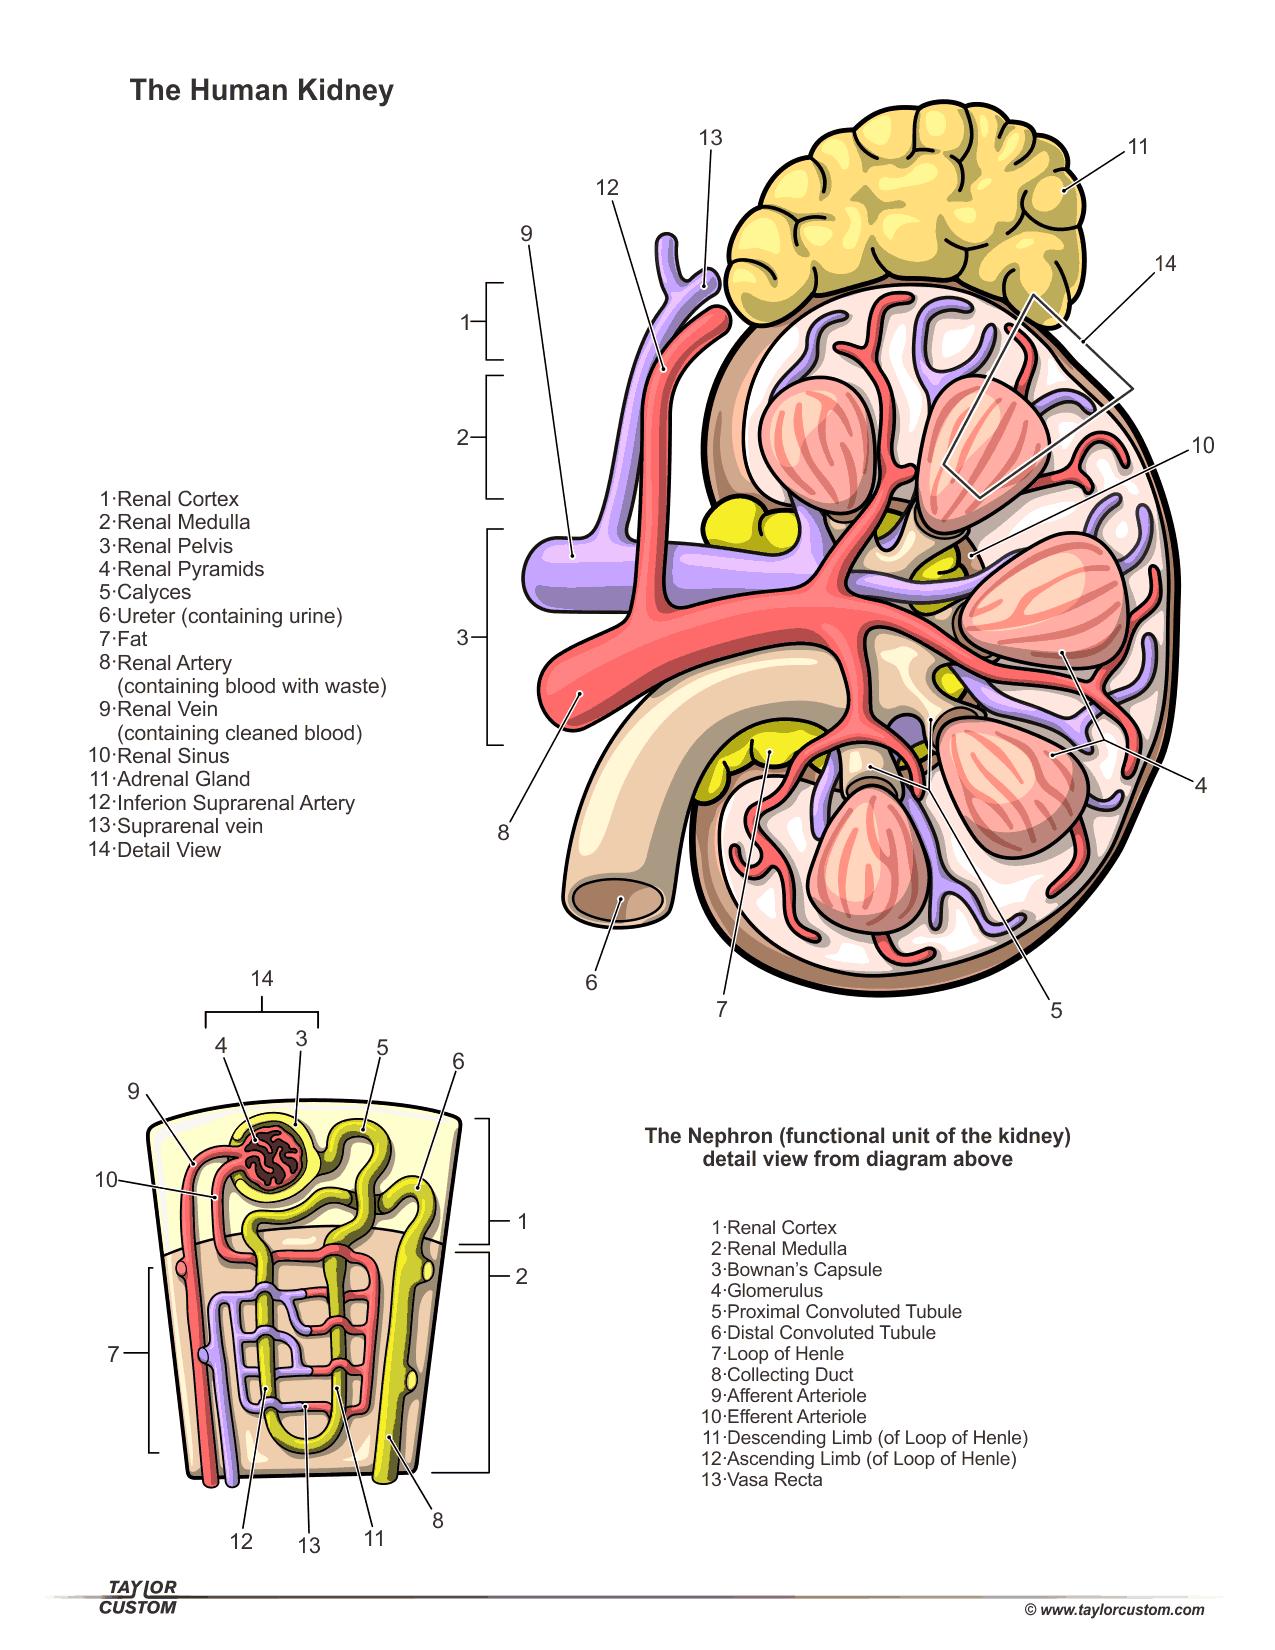 Kidney anatomy glomerulus 9989216 - follow4more.info